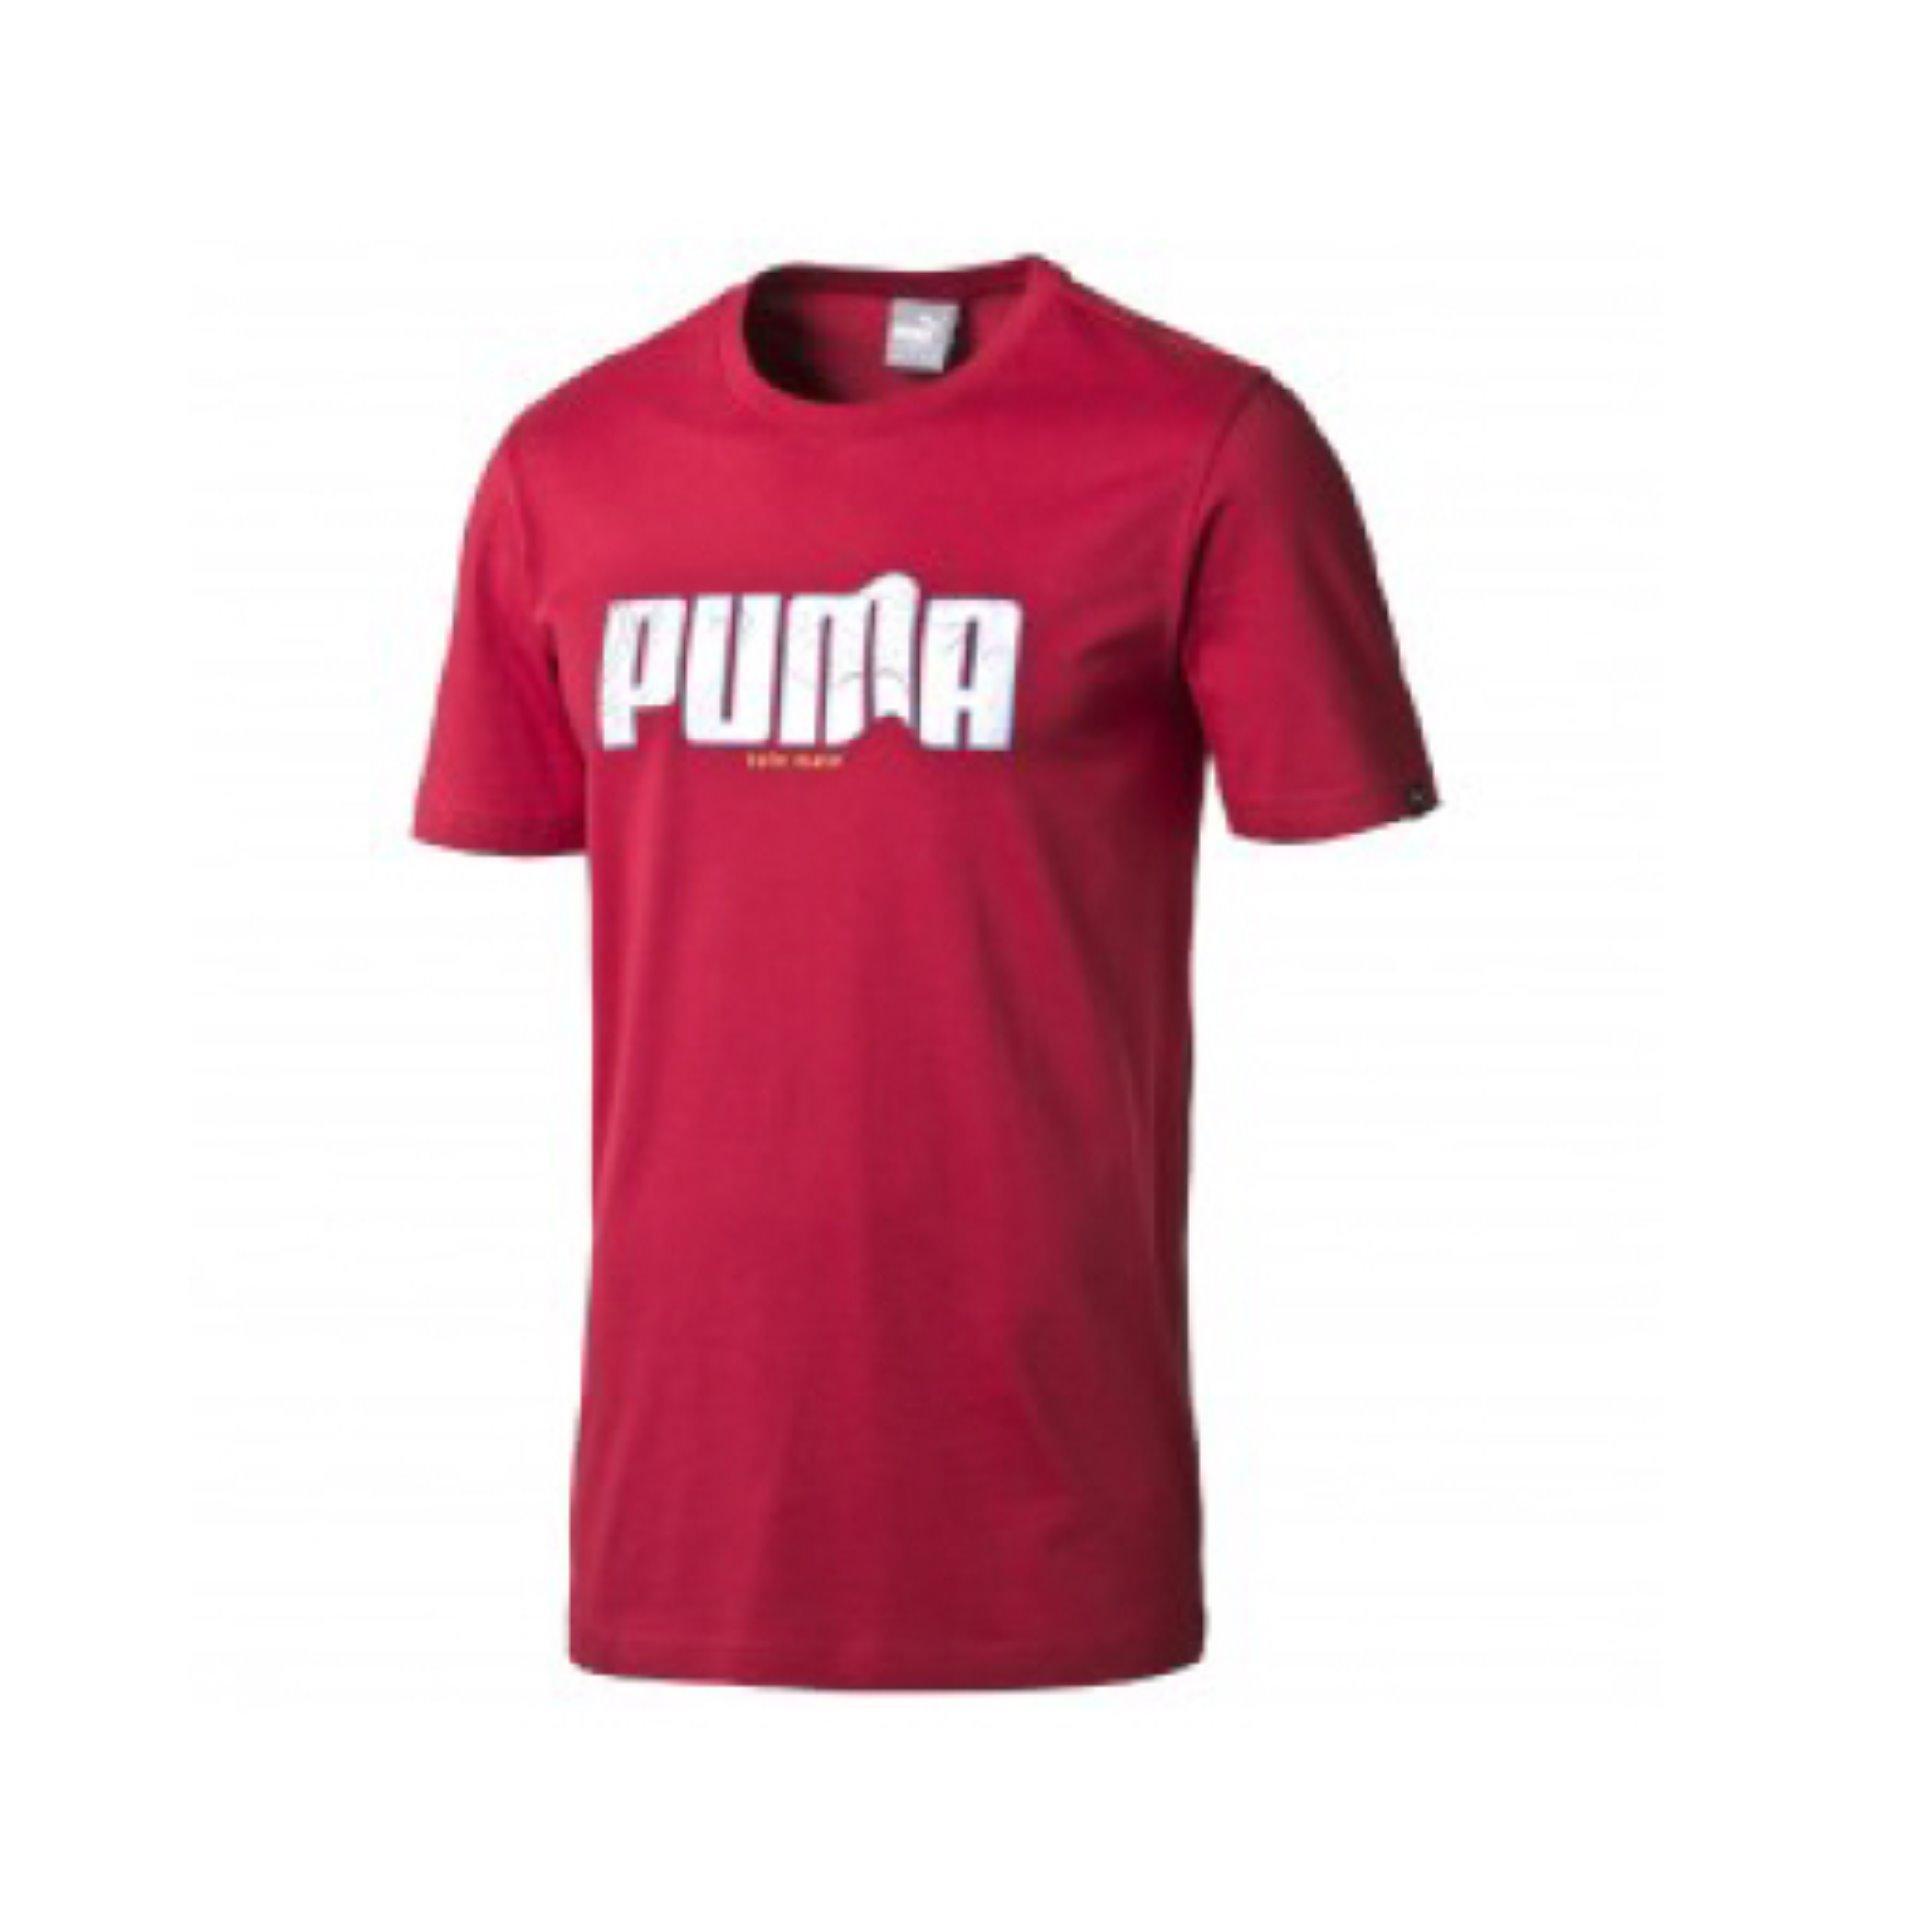 Puma kaos Sneaker Logo Tee - 83440818 - Merah